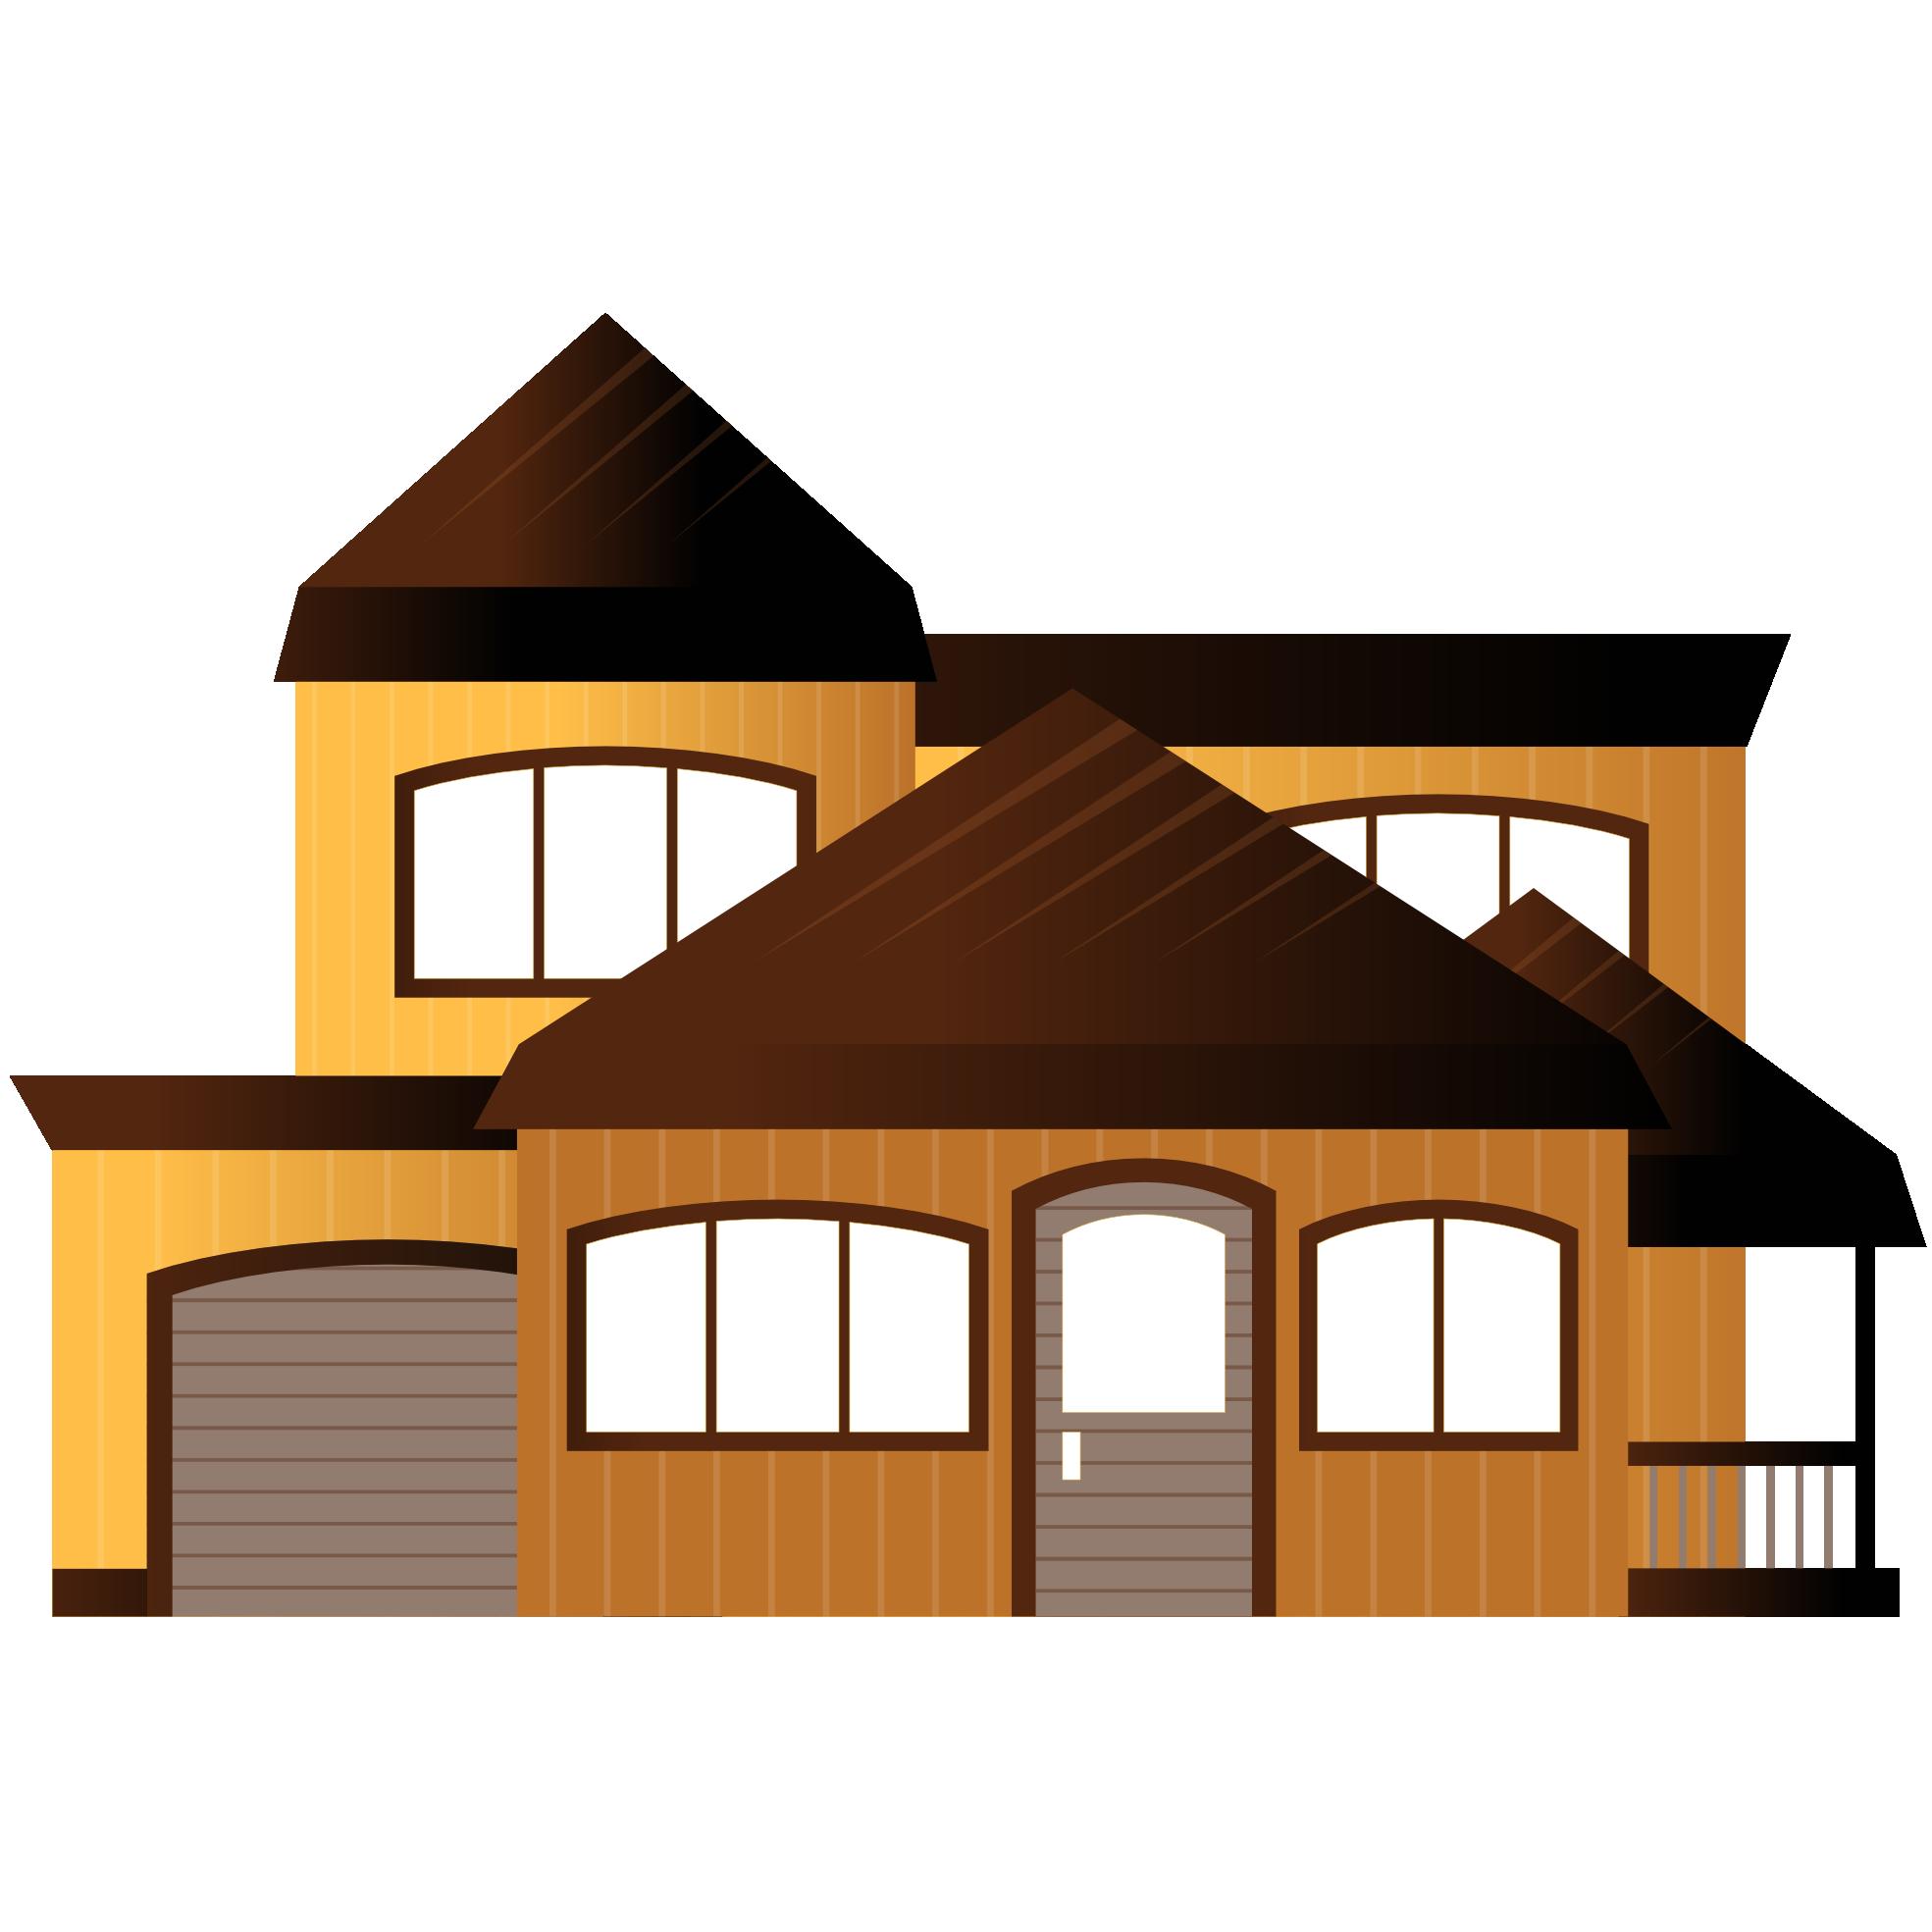 Mansion clipart house design, Mansion house design.